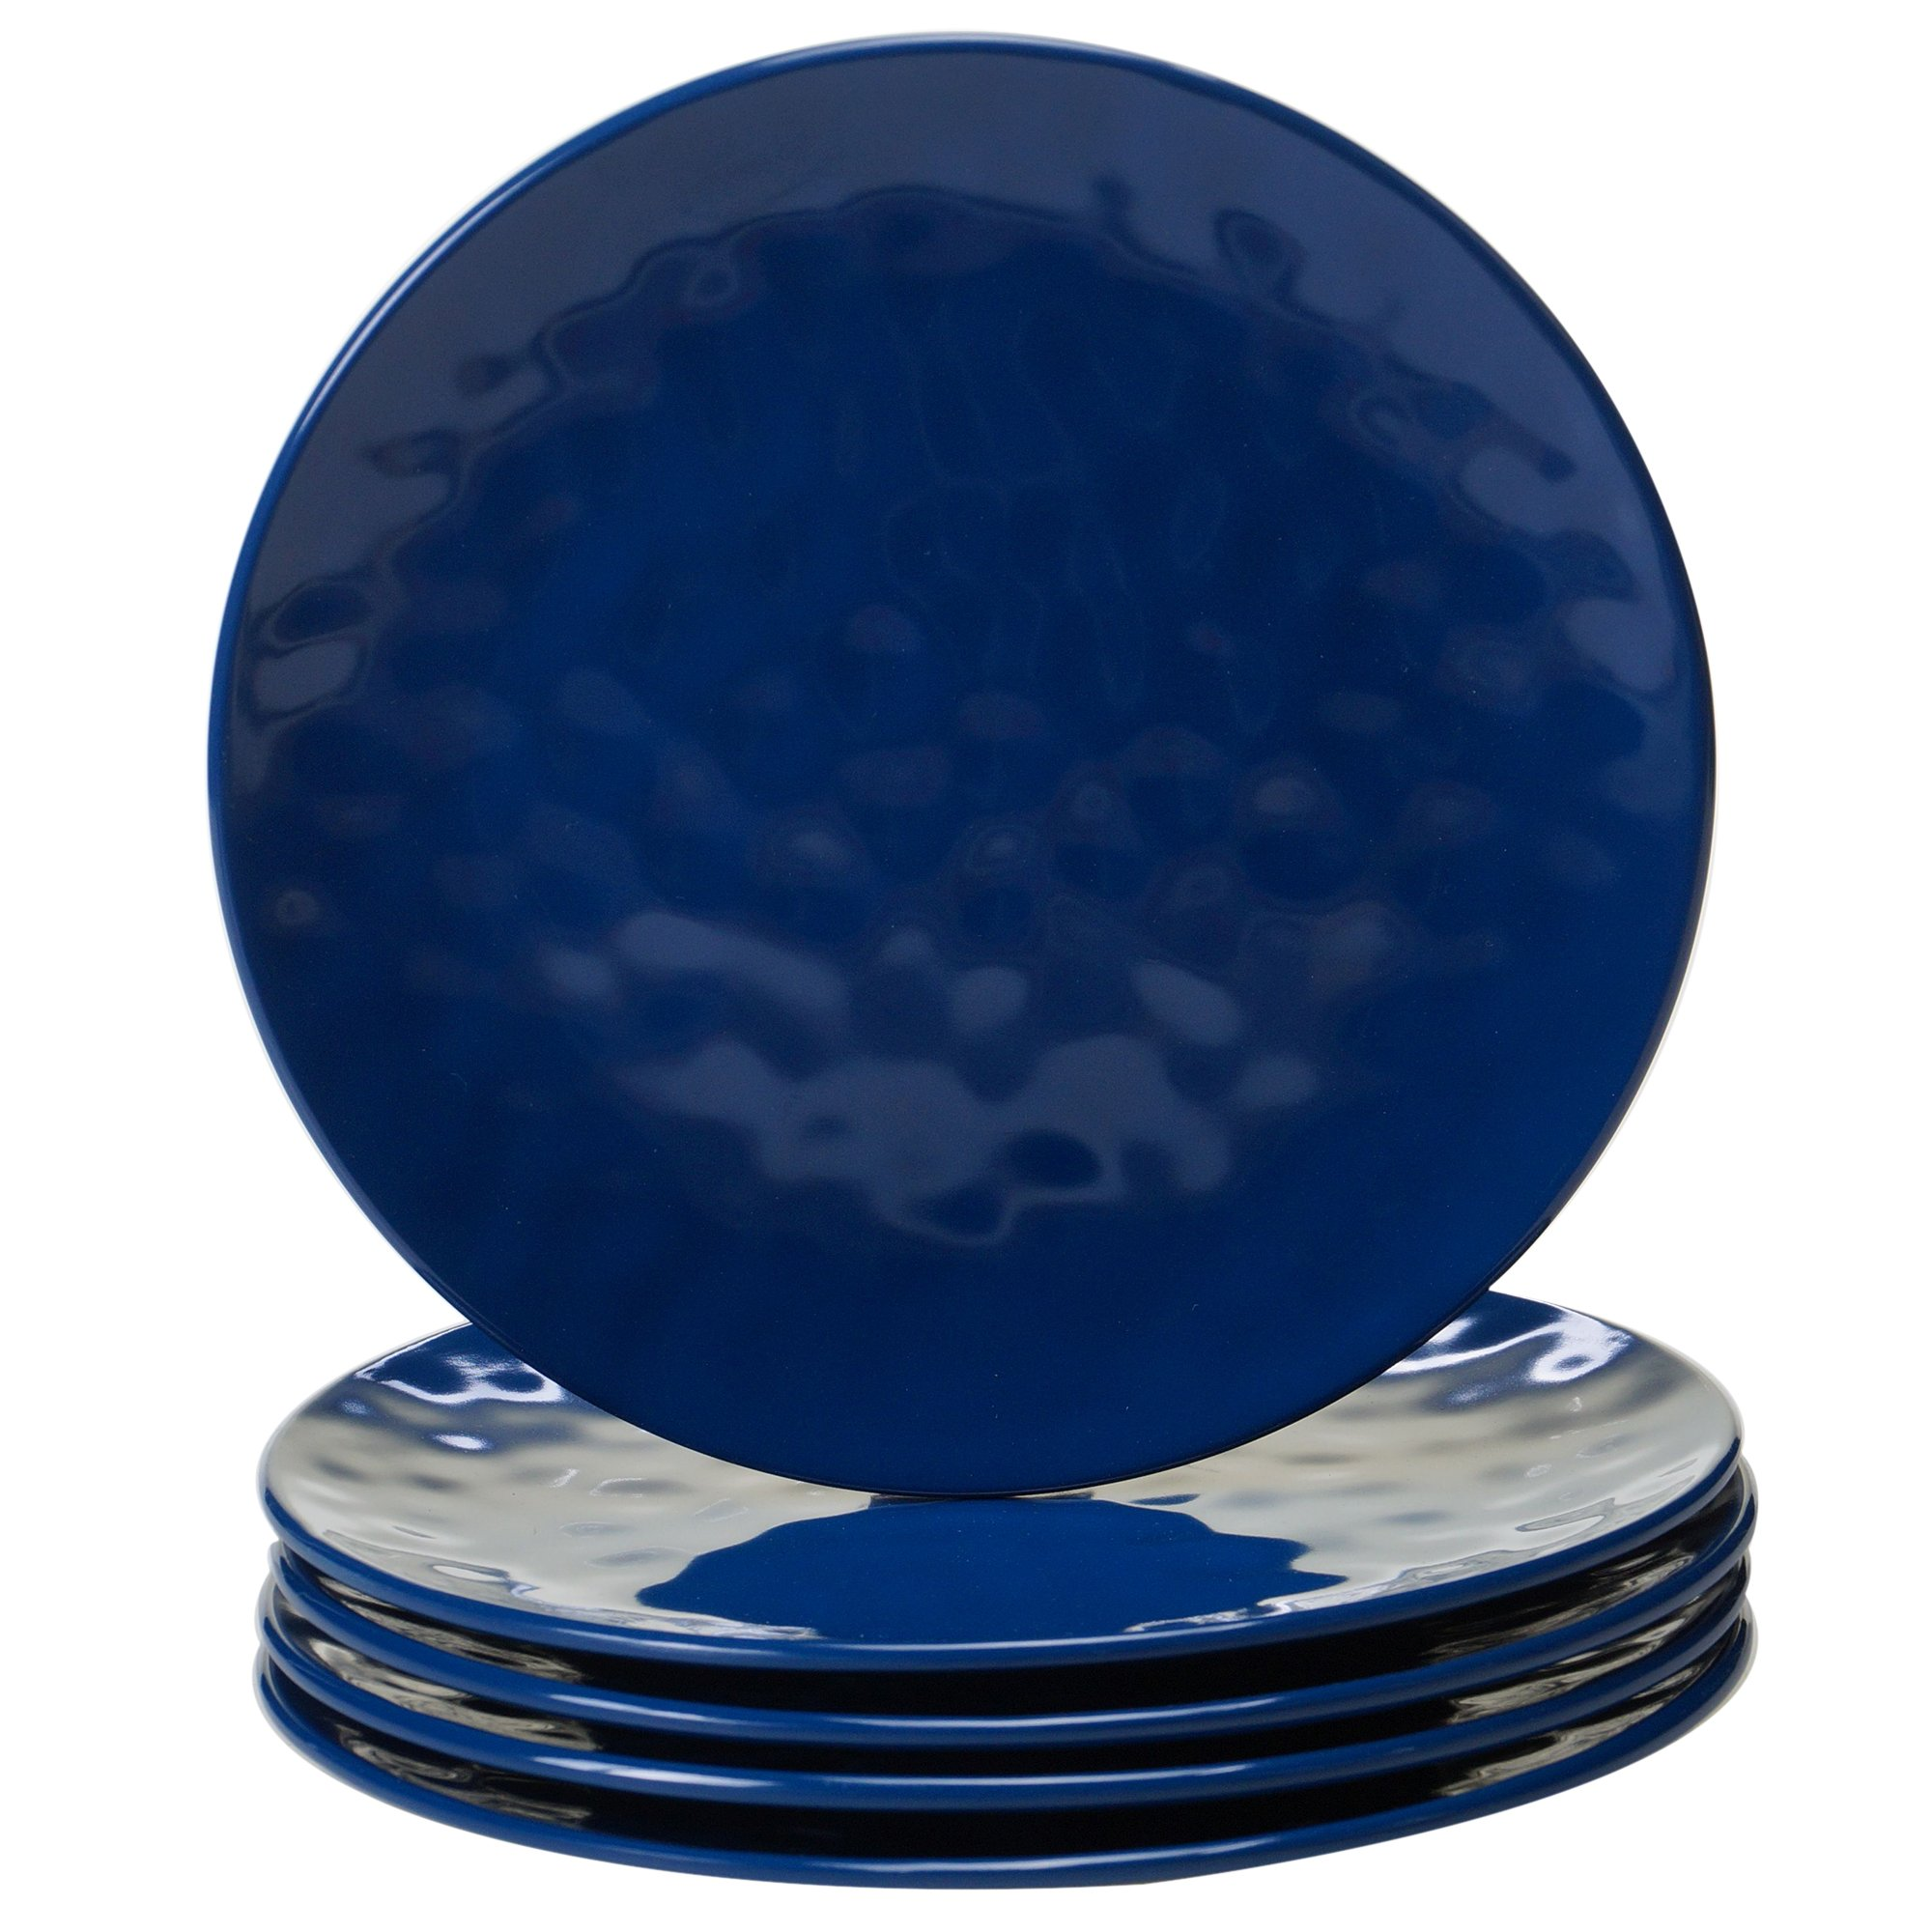 Certified International 9'' Salad/Dessert Plate (Set of 6), Cobalt Blue